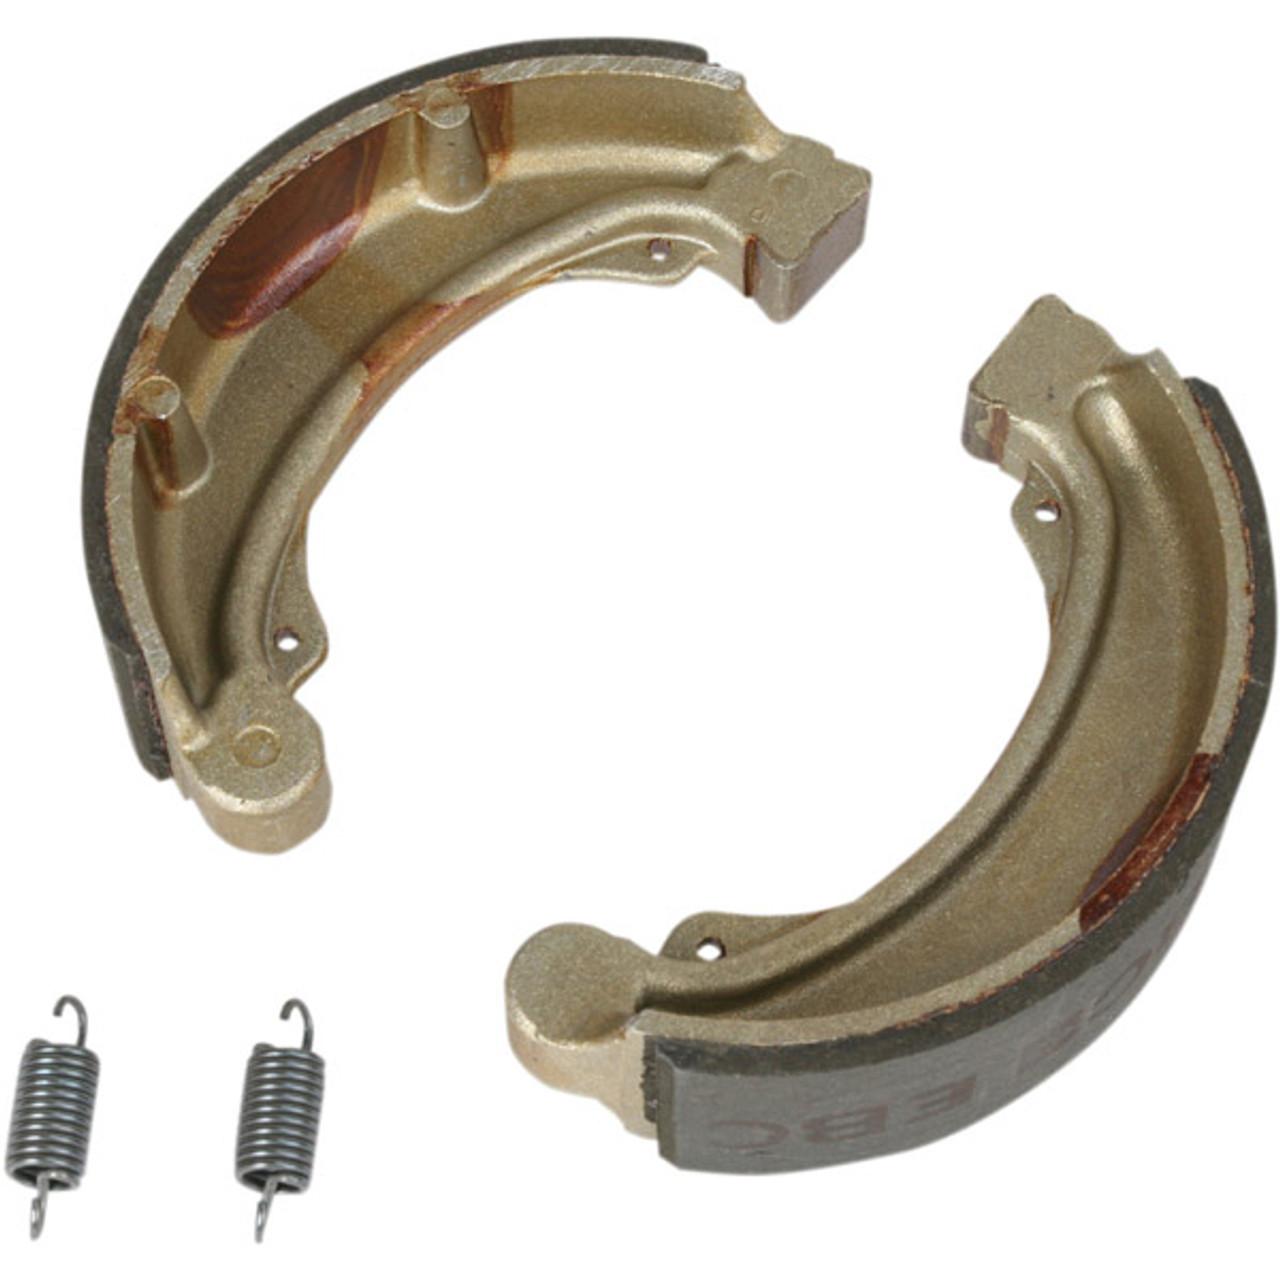 hight resolution of ebc honda cx500c 79 81 rear brake shoes